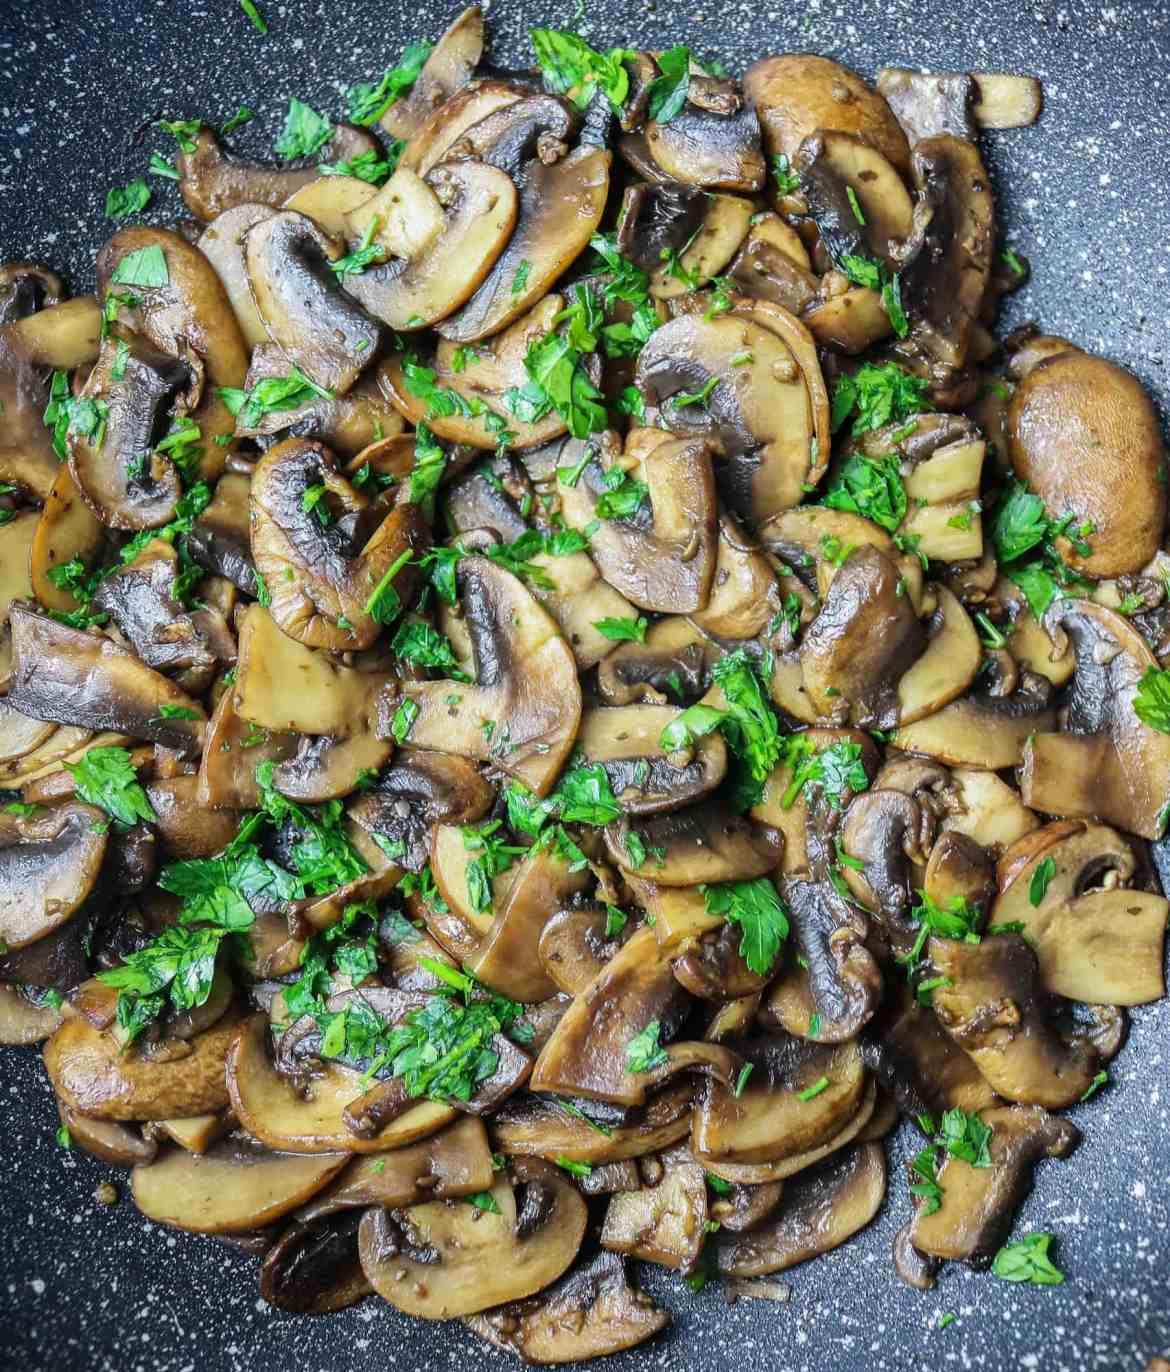 sautéed cremini mushrooms with fresh parsley